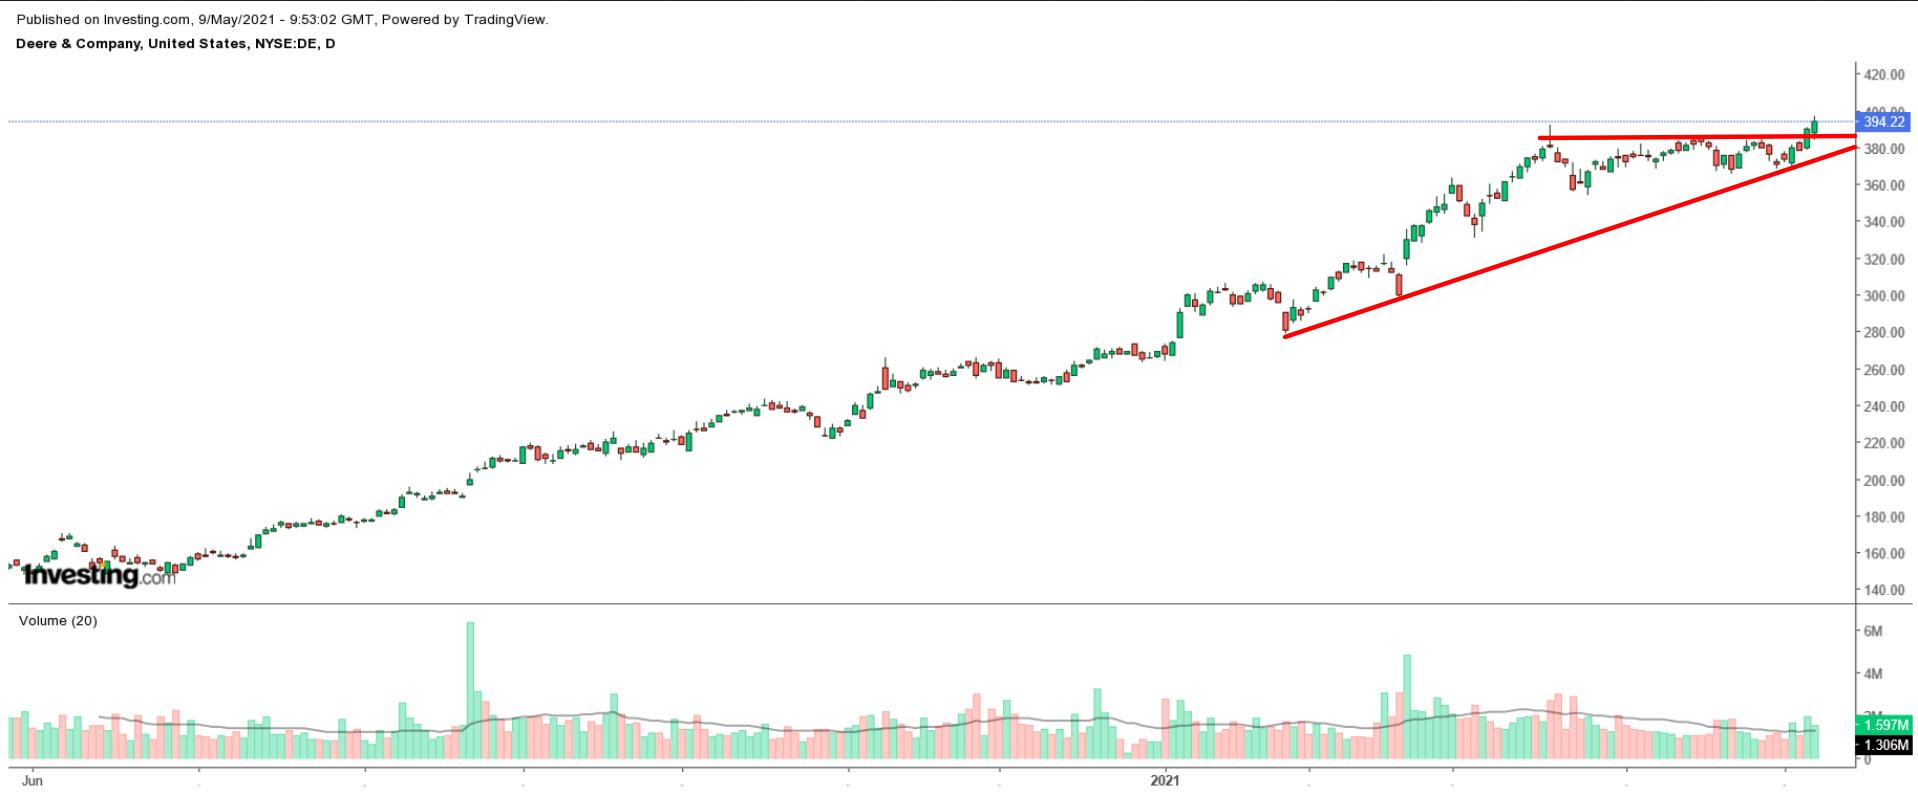 Deere Stock Daily Chart